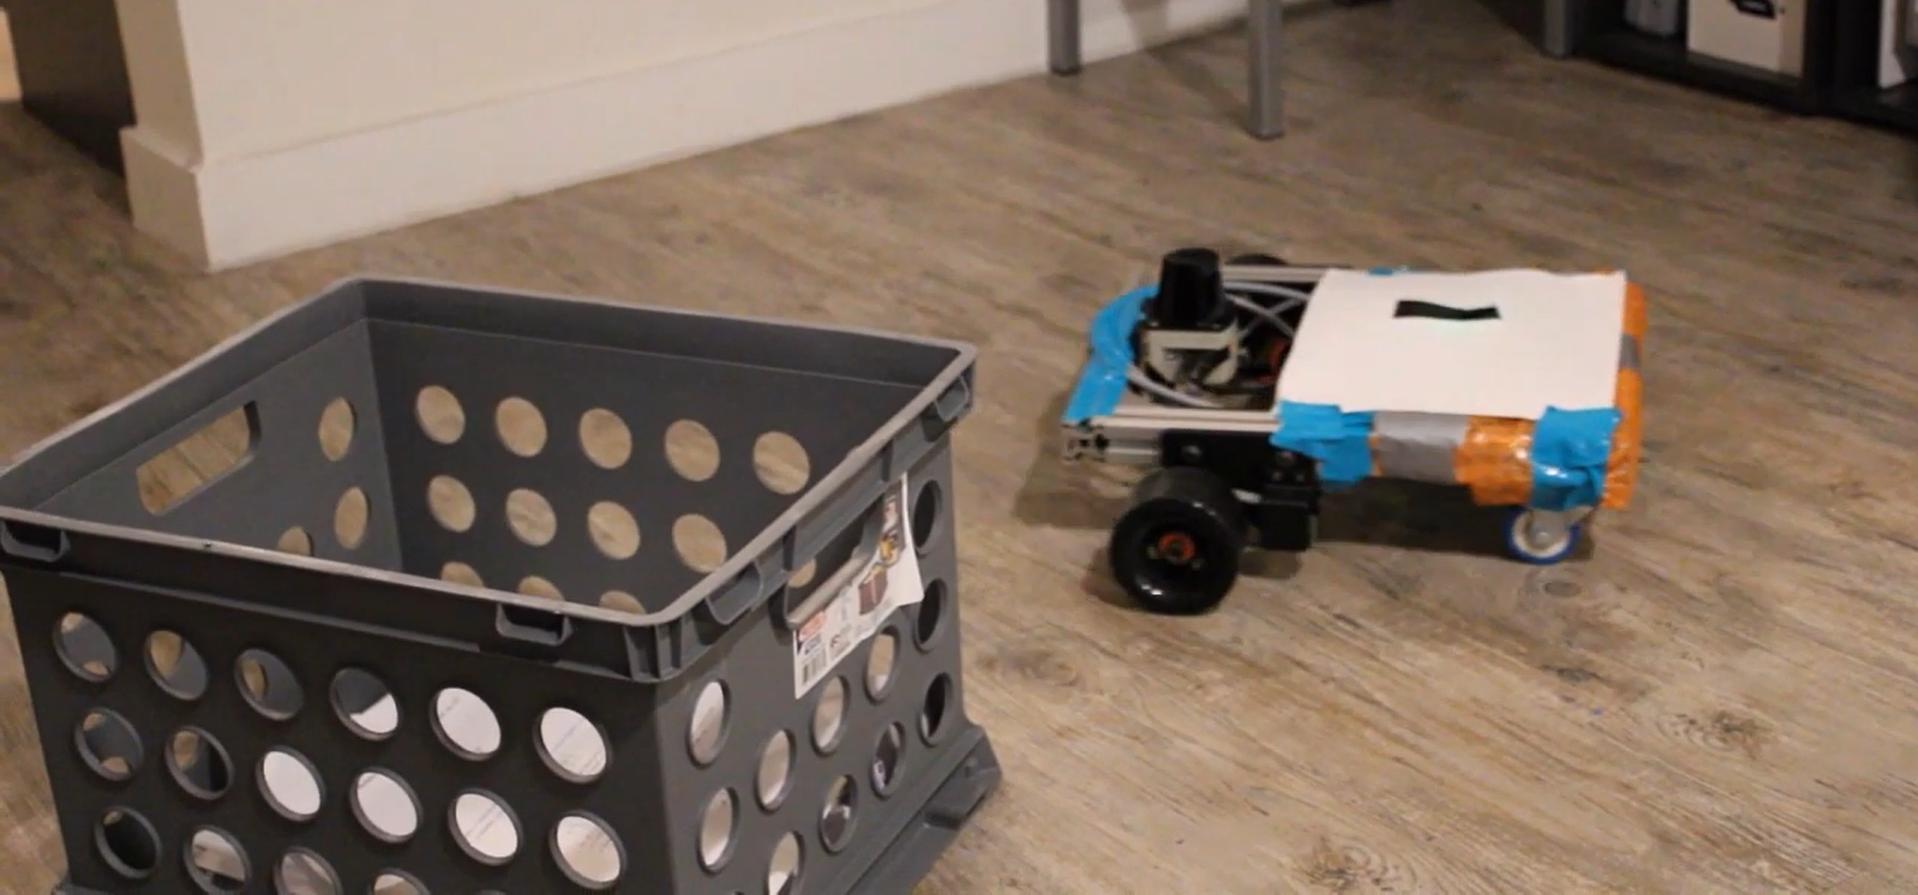 tamu SICK tiM10k Challenge Friendly Guide Robot VALE